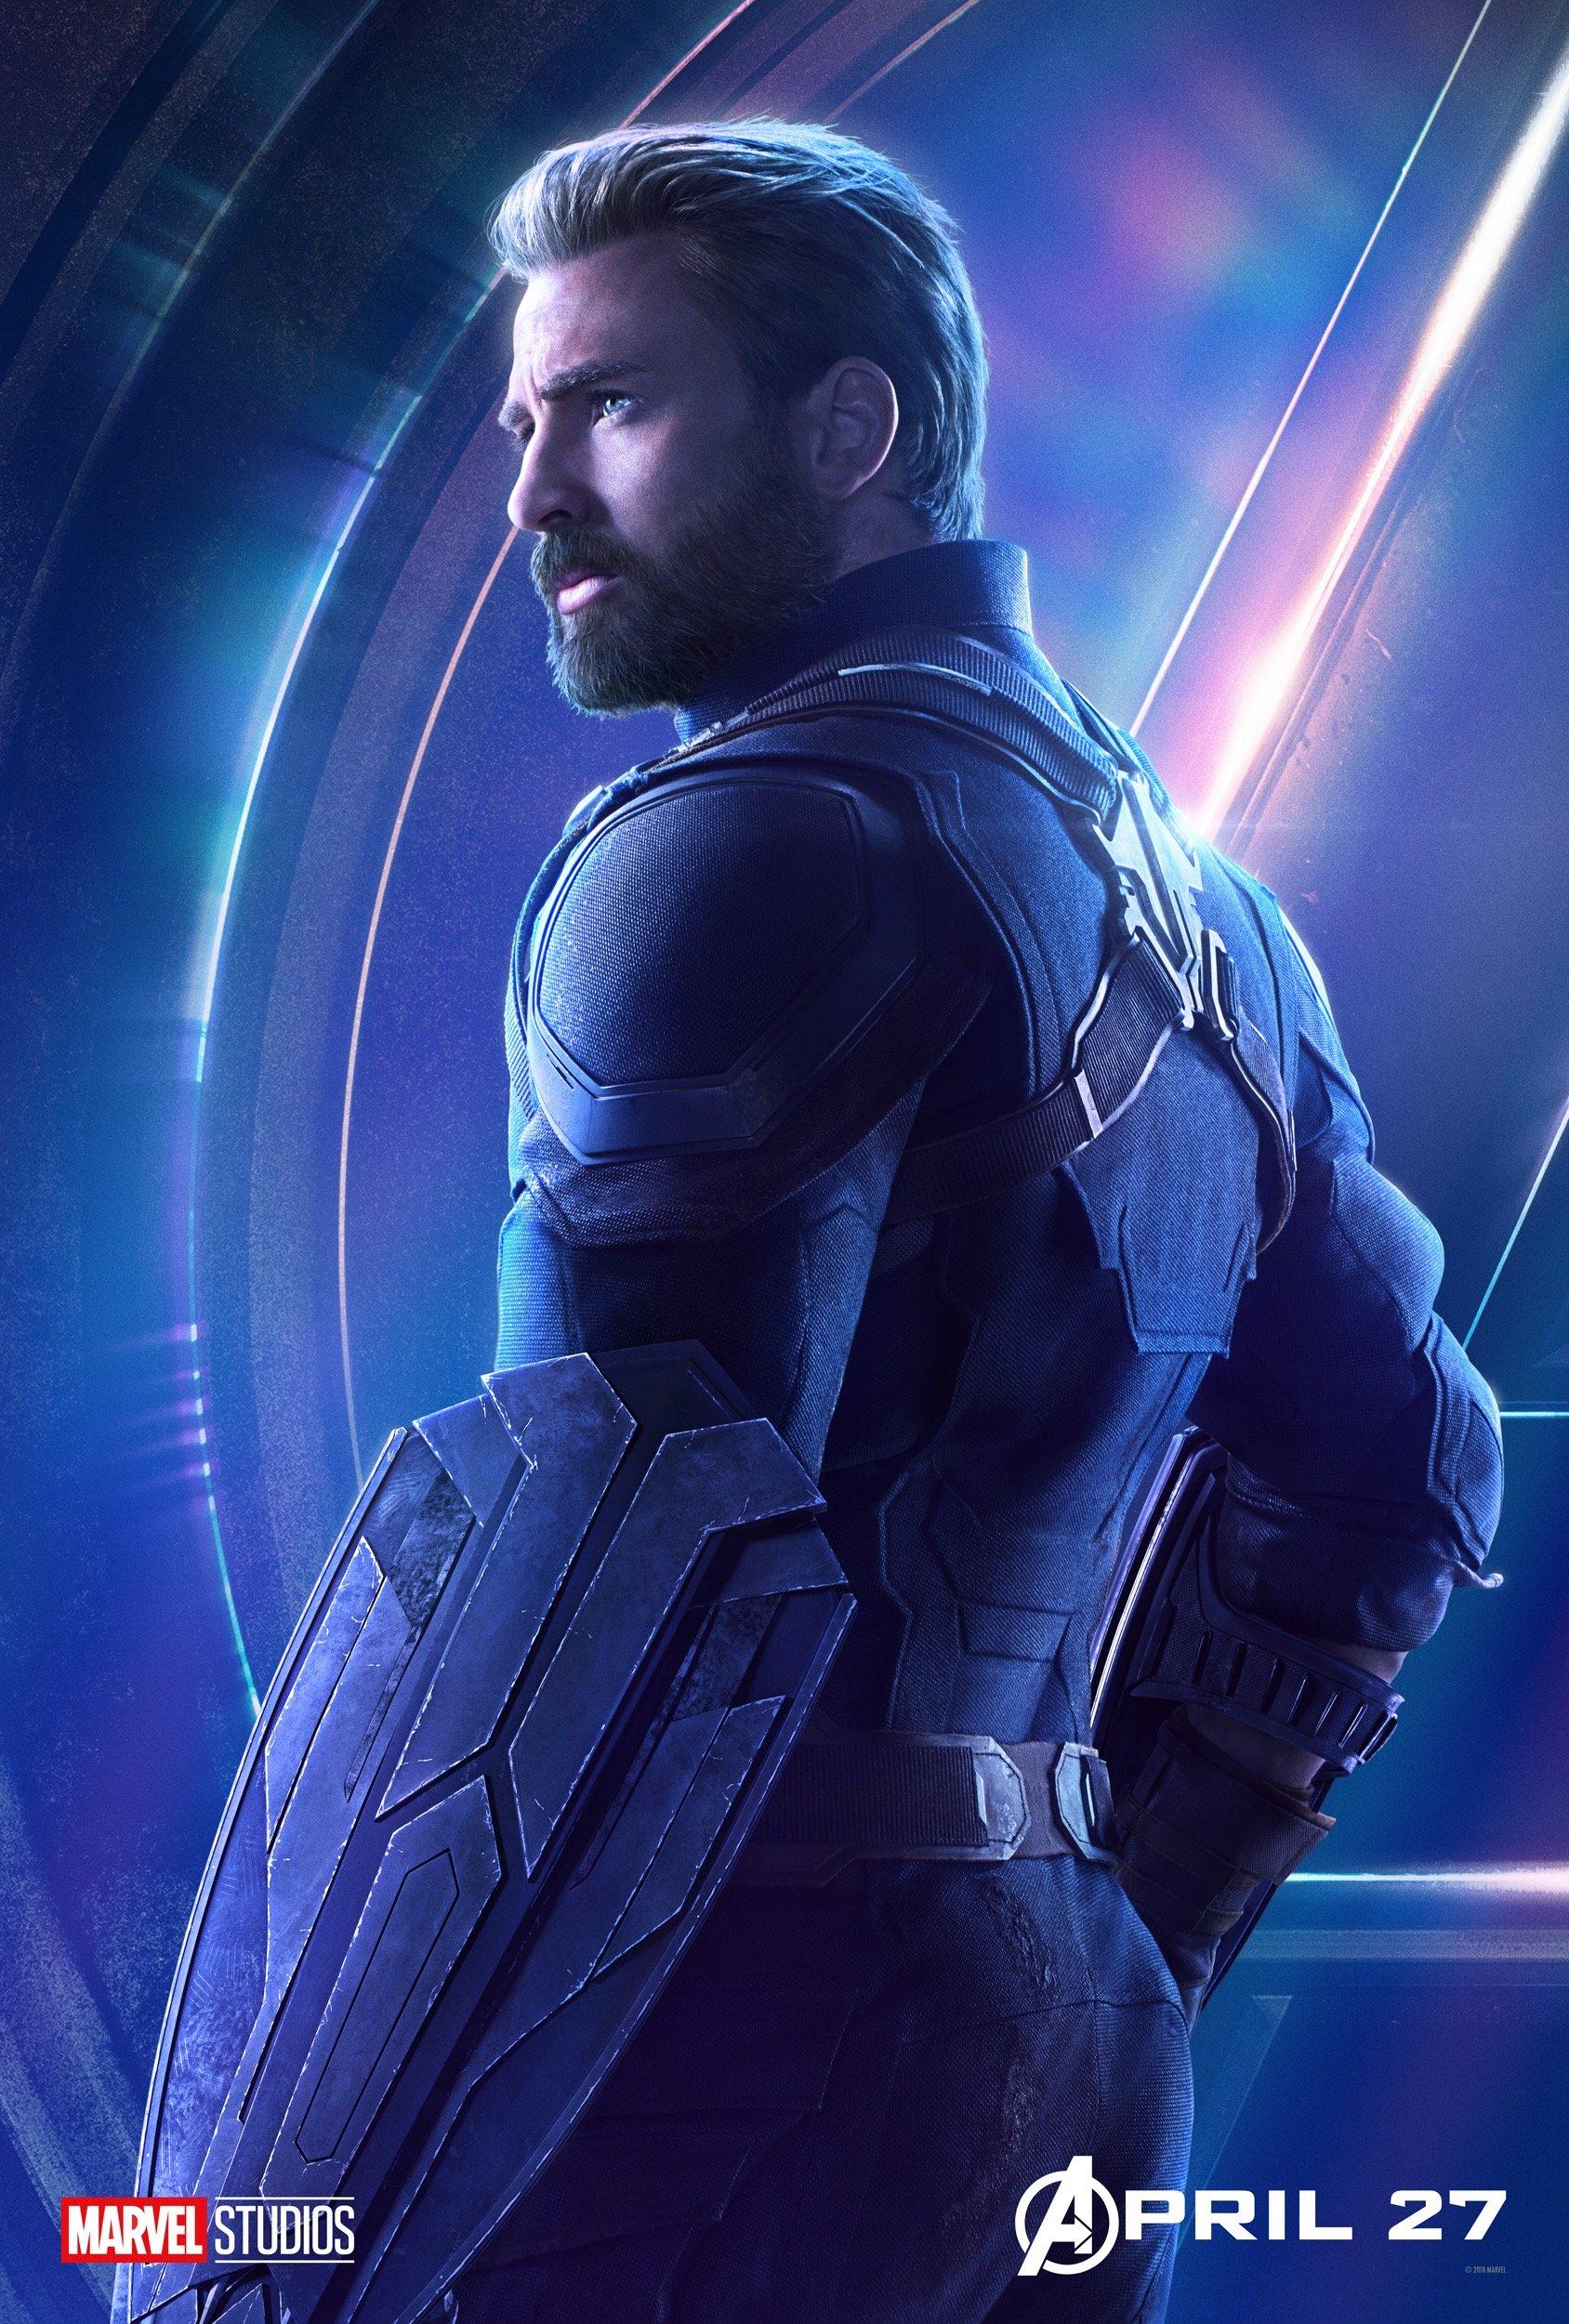 Steven Rogers Marvel Movies Fandom Powered By Wikia